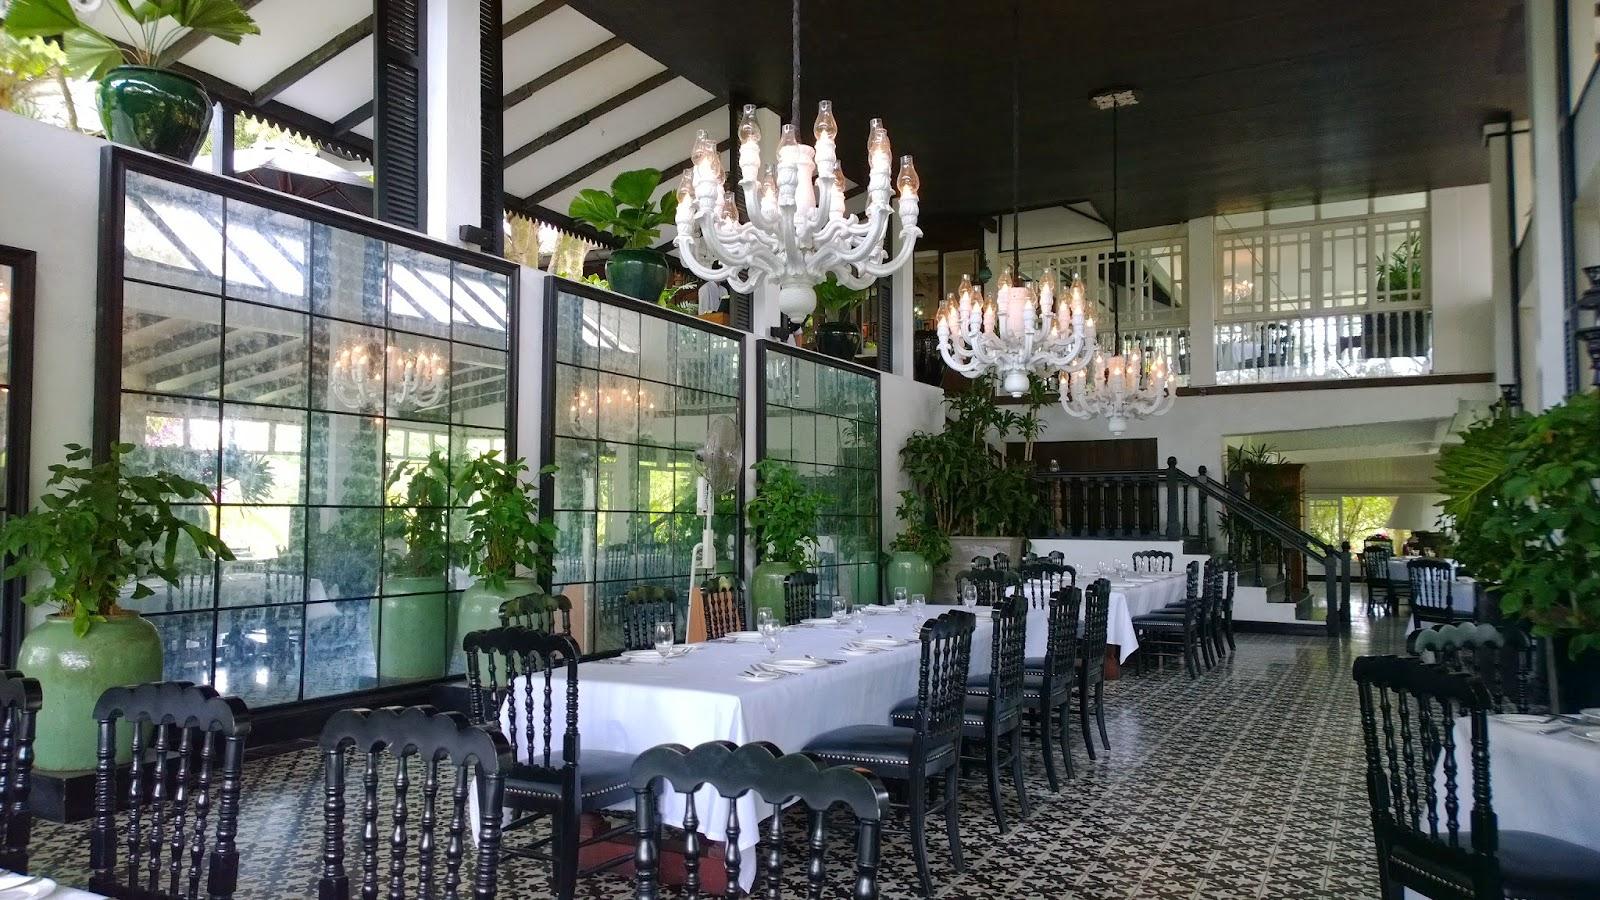 Best Restaurant In Tagaytay